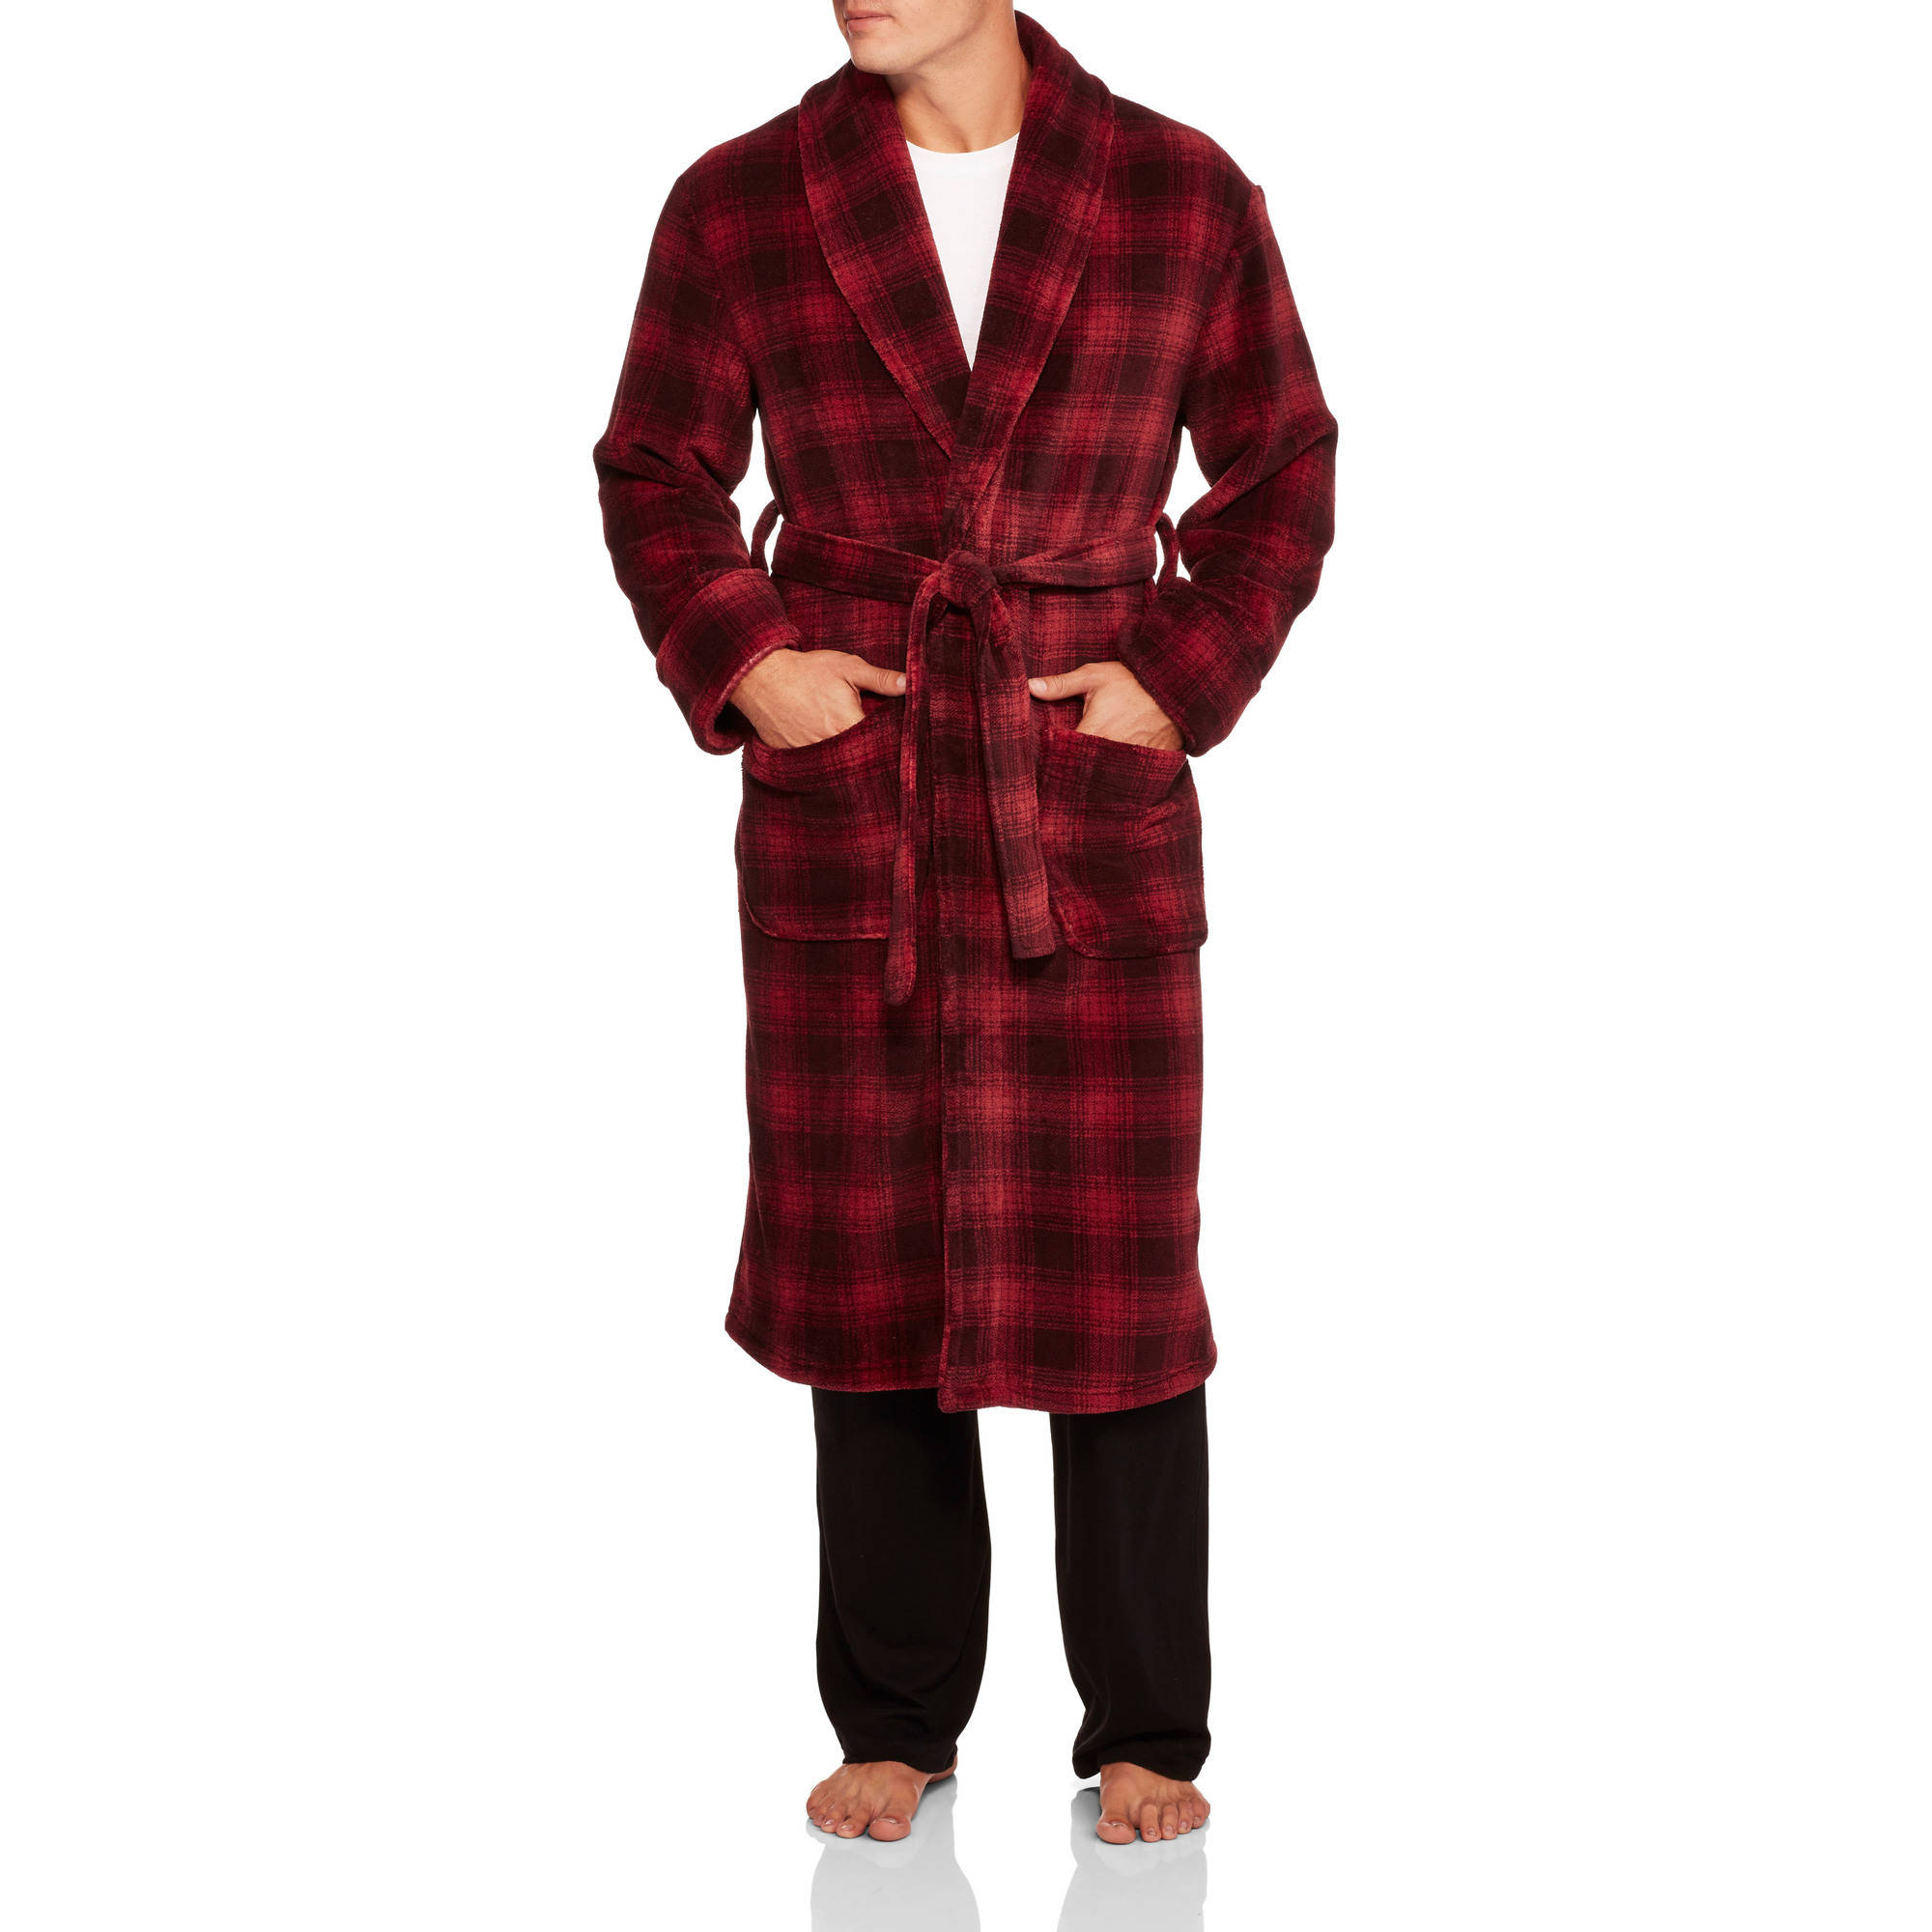 Max Deco Big Men's Printed Plush Robe